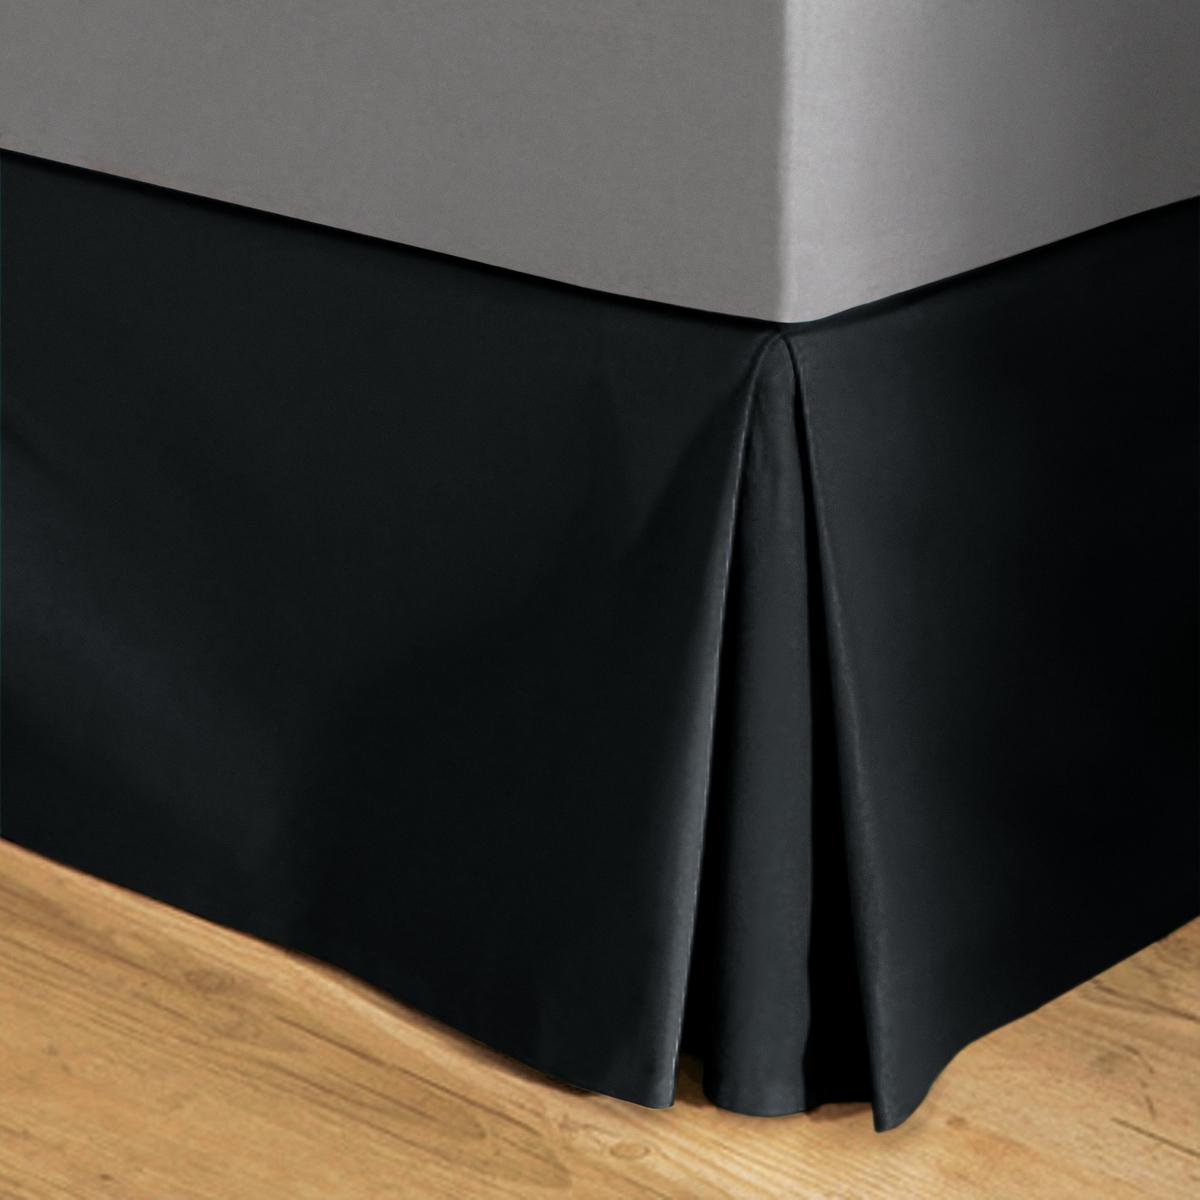 Наматрасник La Redoute La Redoute 180 x 200 см черный комплект из полотенце для la redoute рук из хлопка и льна nipaly 50 x 100 см белый